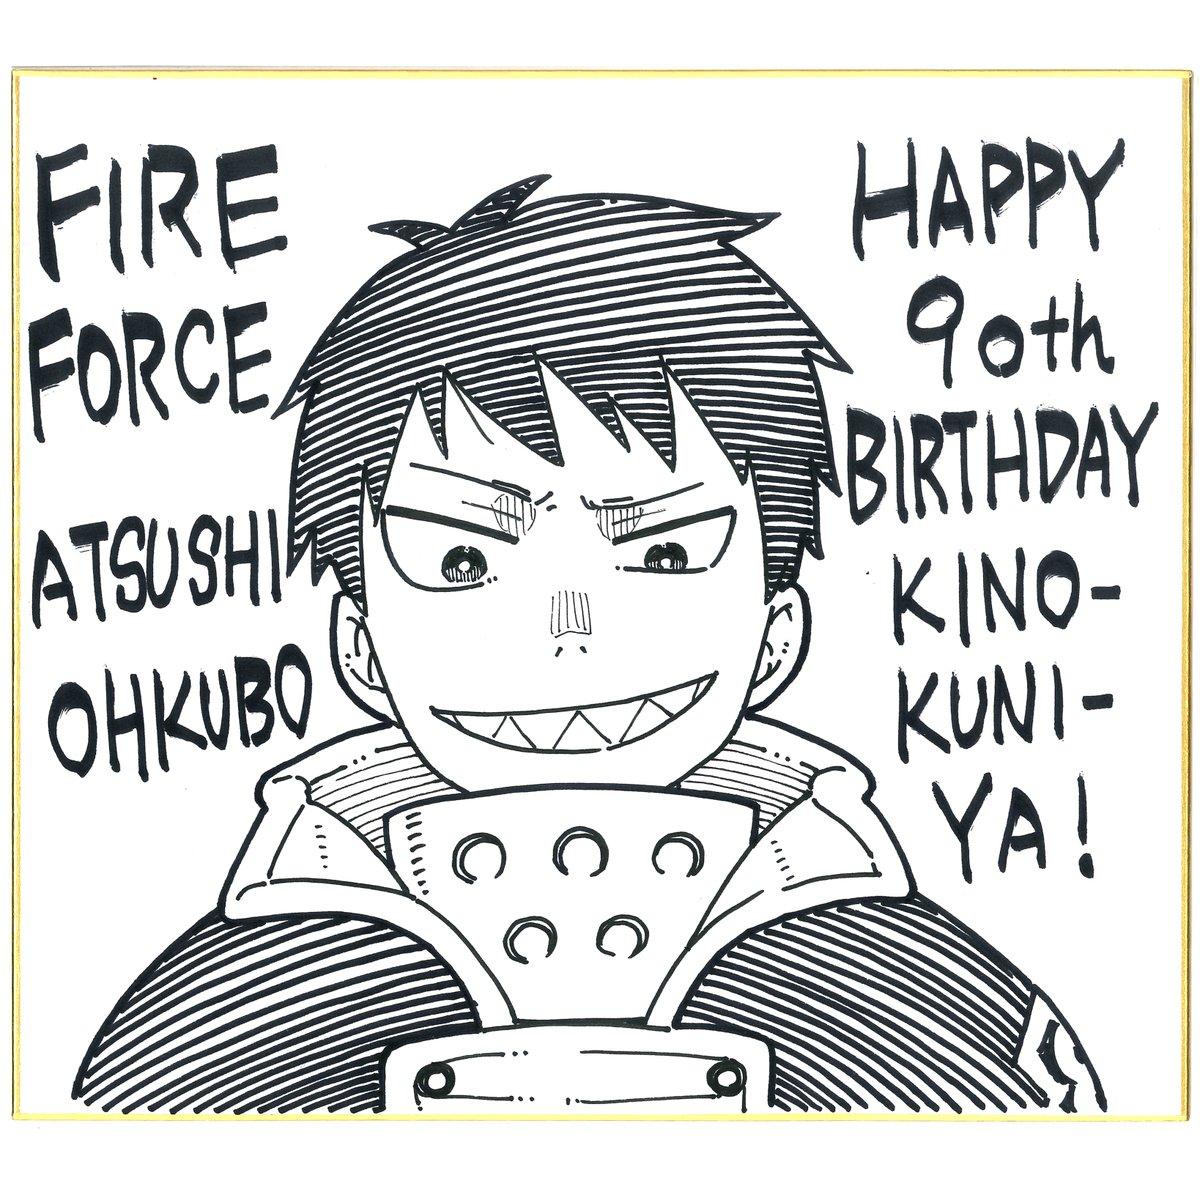 Kinokuniya USA On Twitter Thank You Atsushi Ohkubo For Drawing